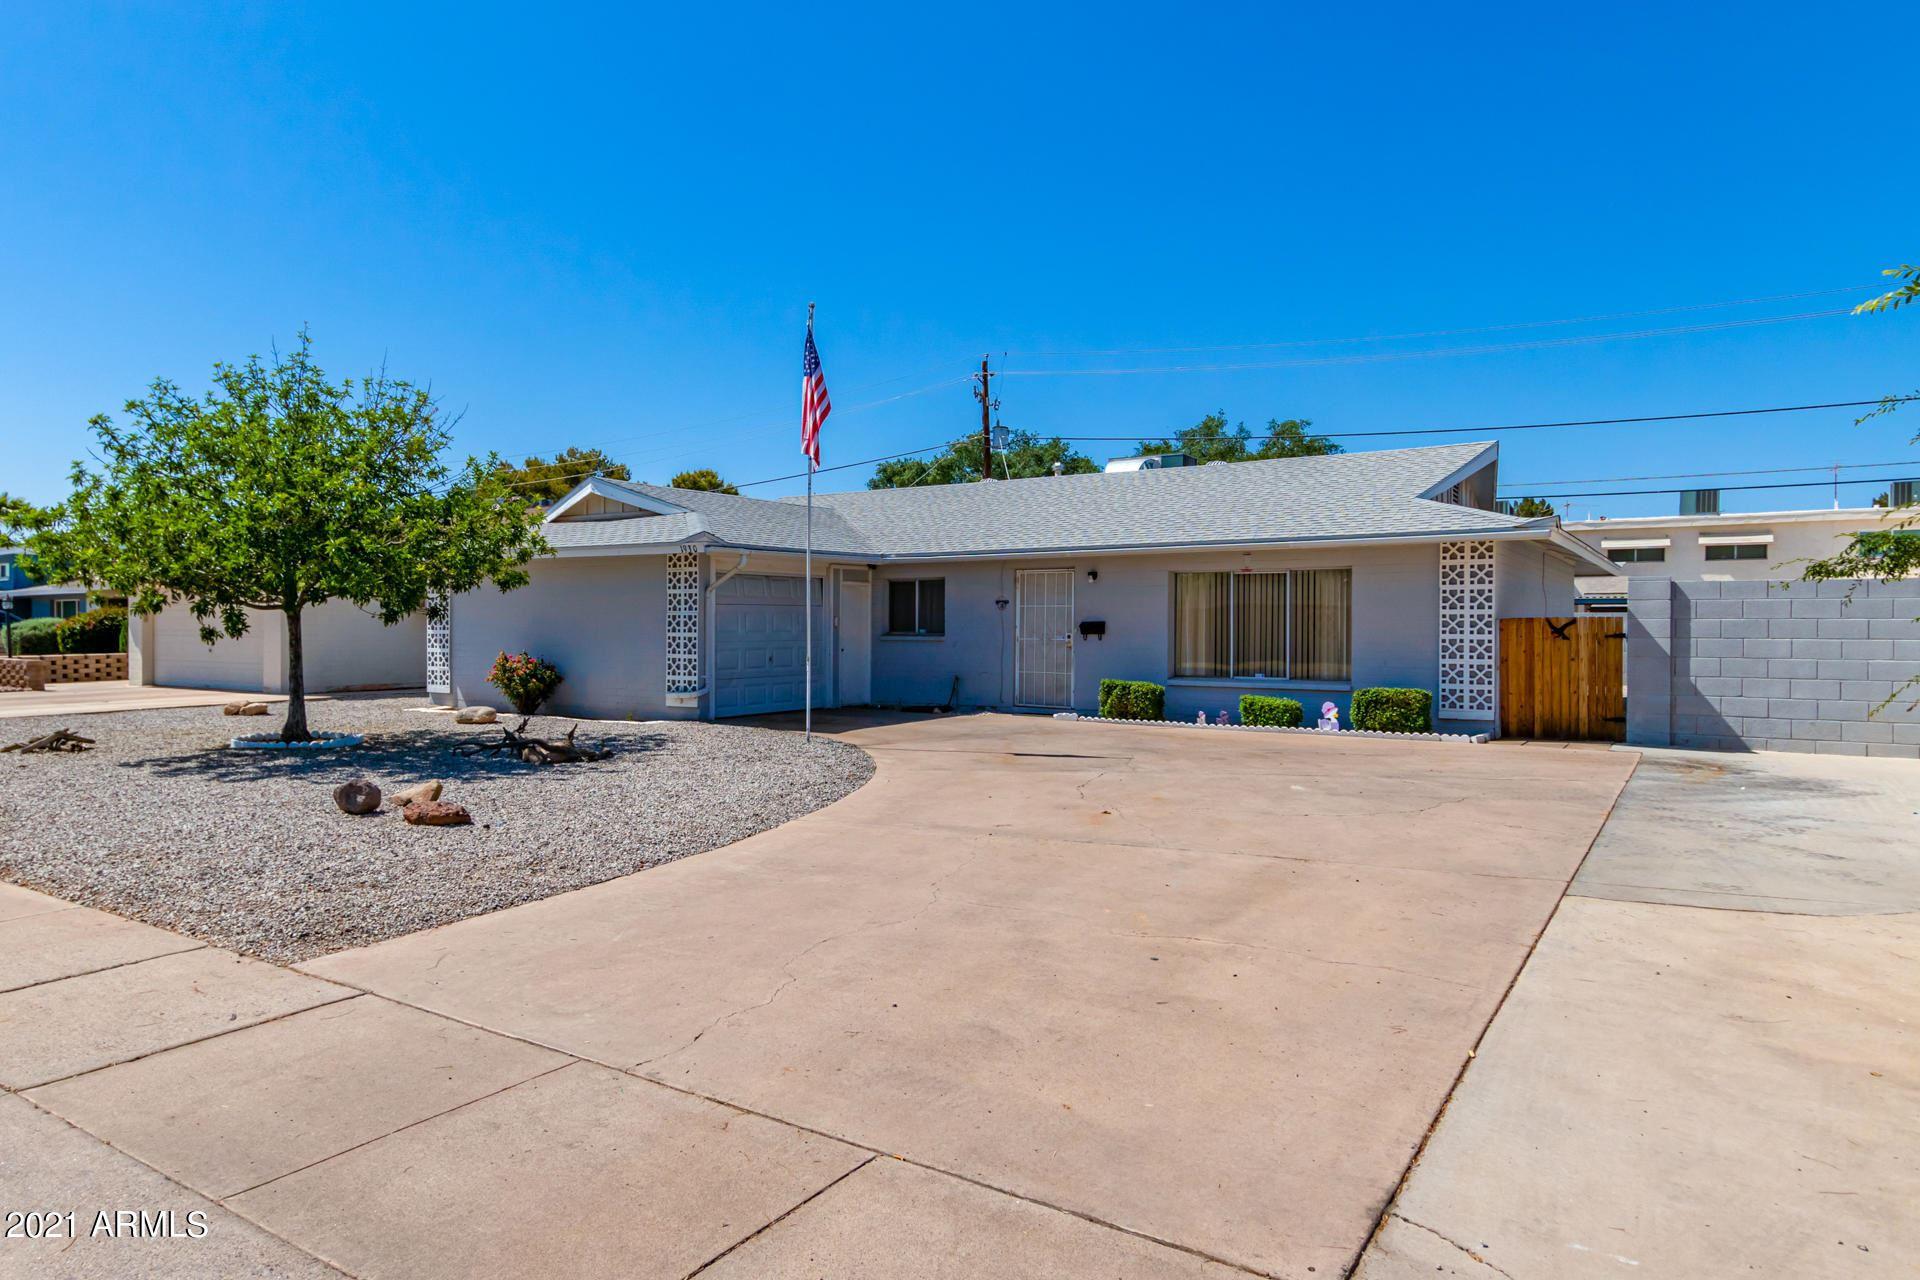 1930 W HAZELWOOD Street, Phoenix, AZ 85015 - MLS#: 6234476